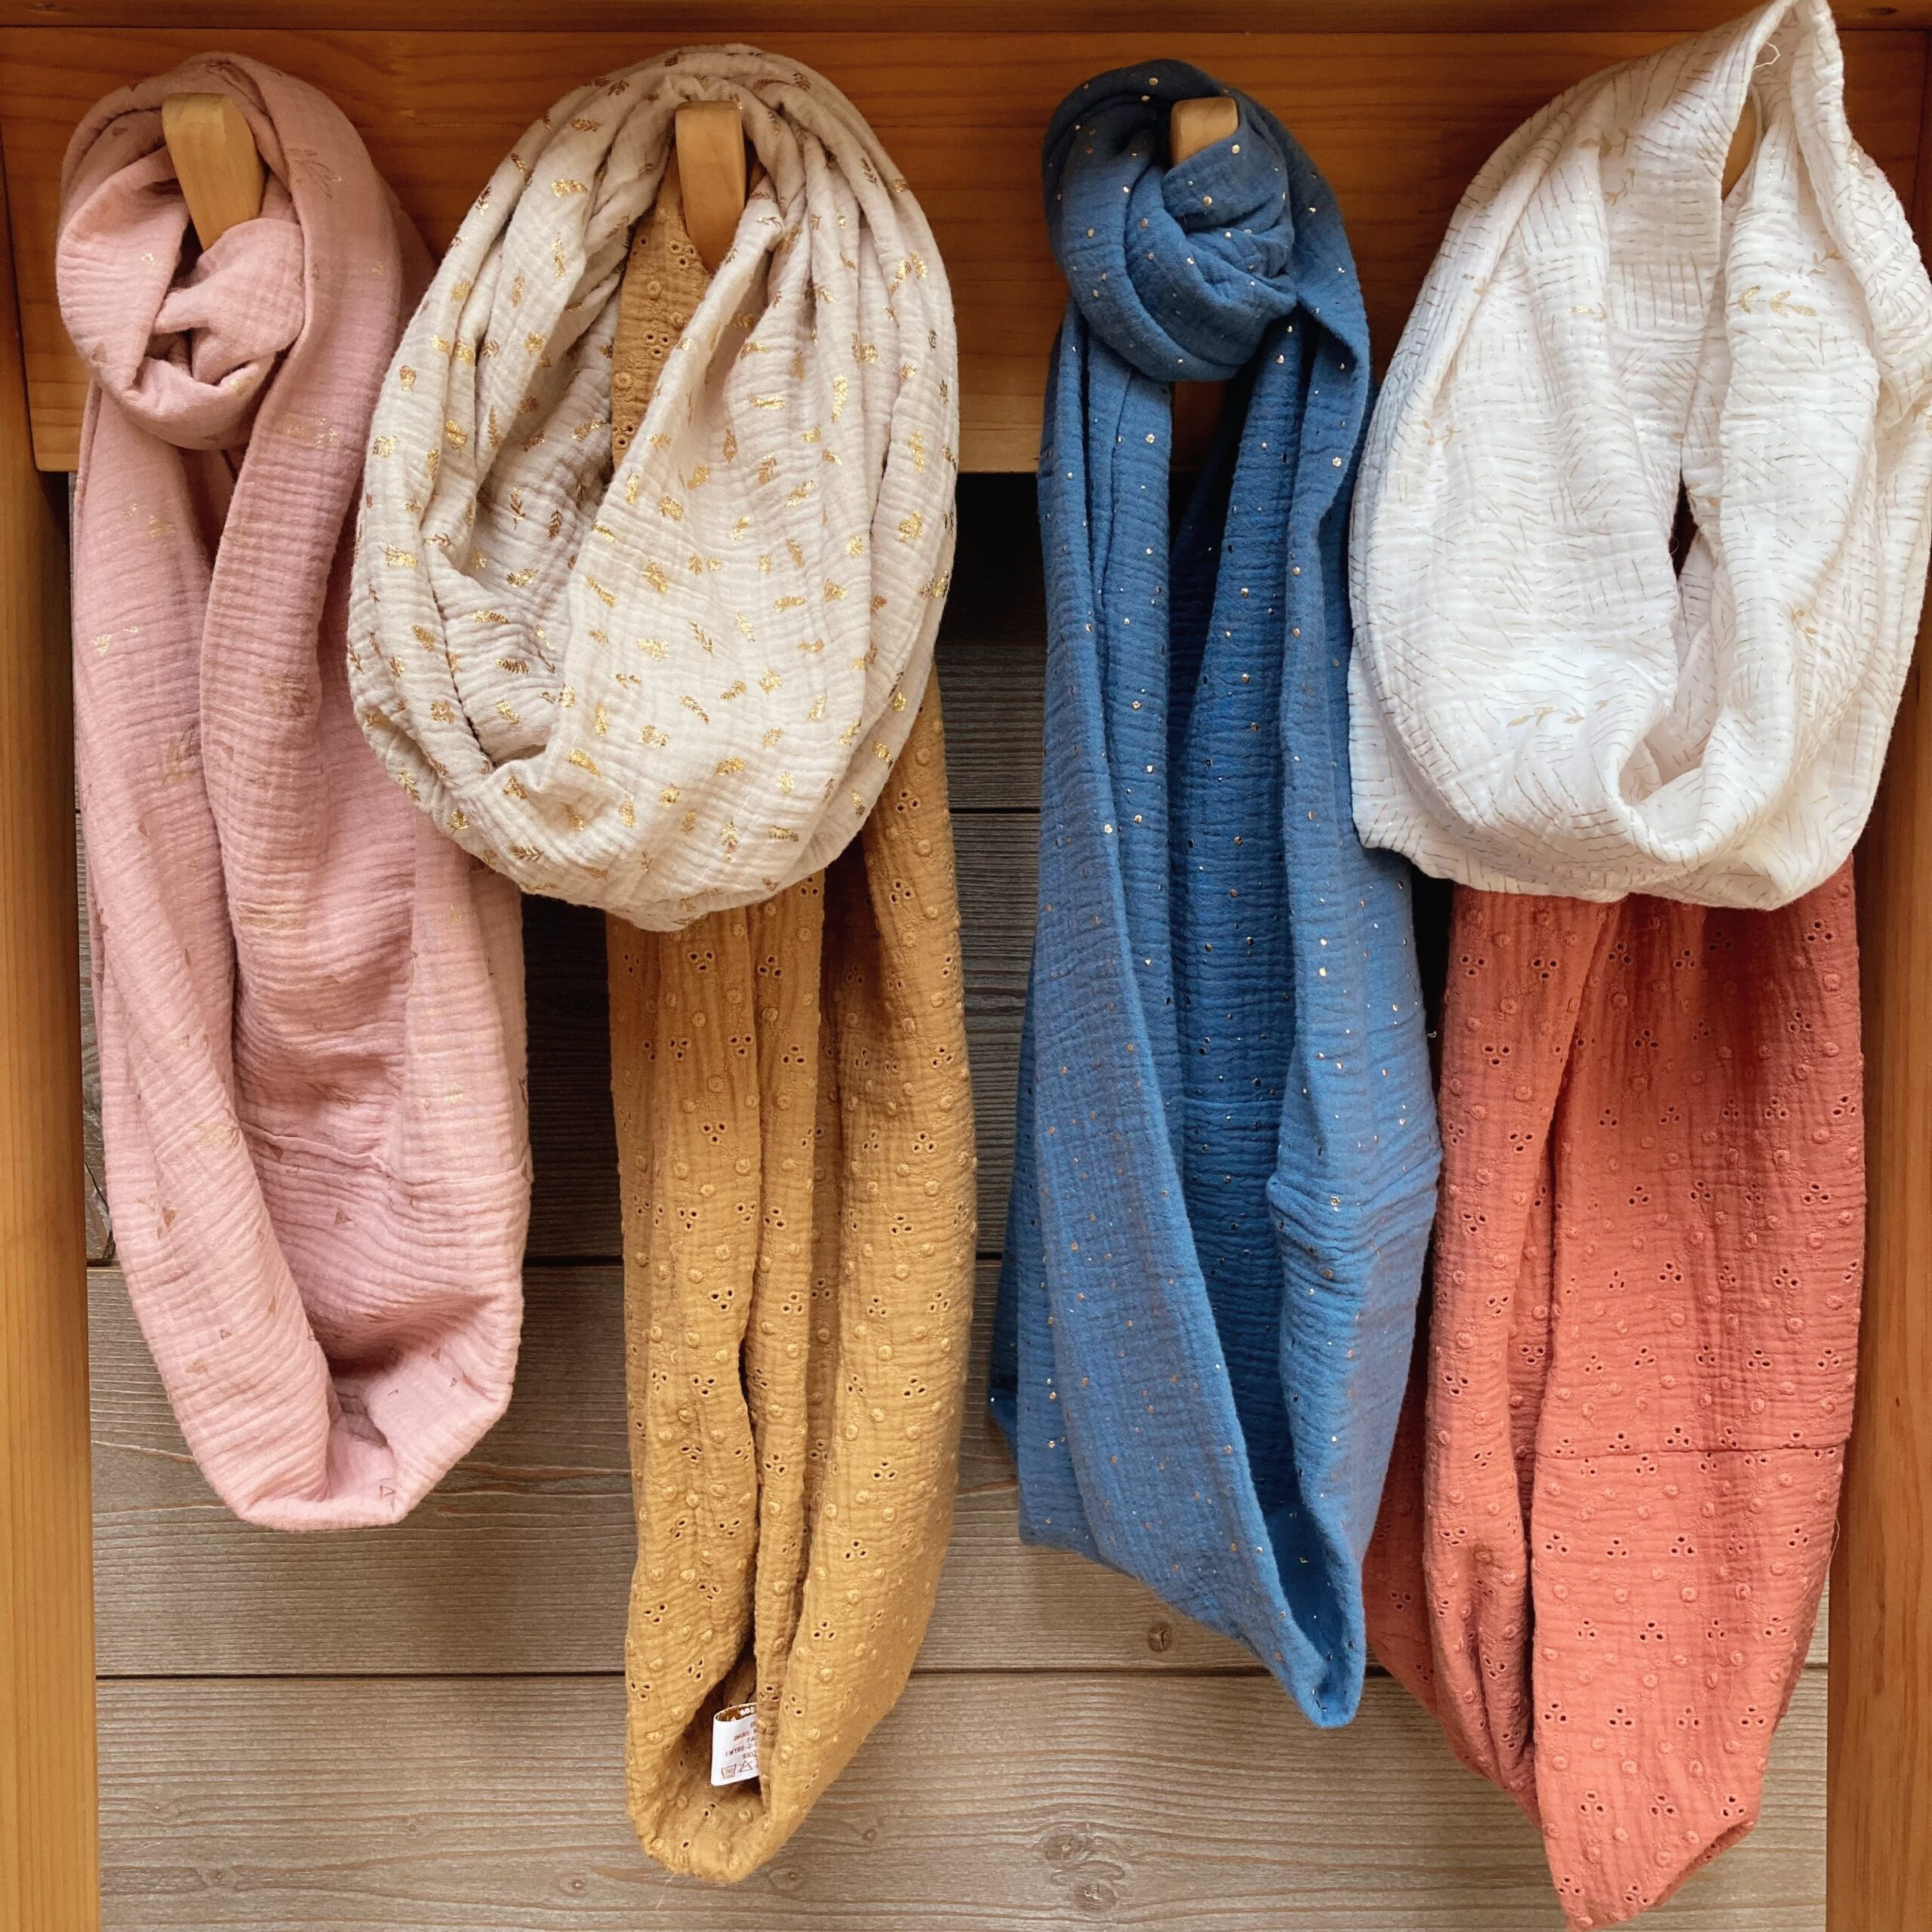 echarpes-snoods-femmes-made-in-France-collection-de-rentree-terres-de-moissons-dorees-du-vent-dans-mes-valises